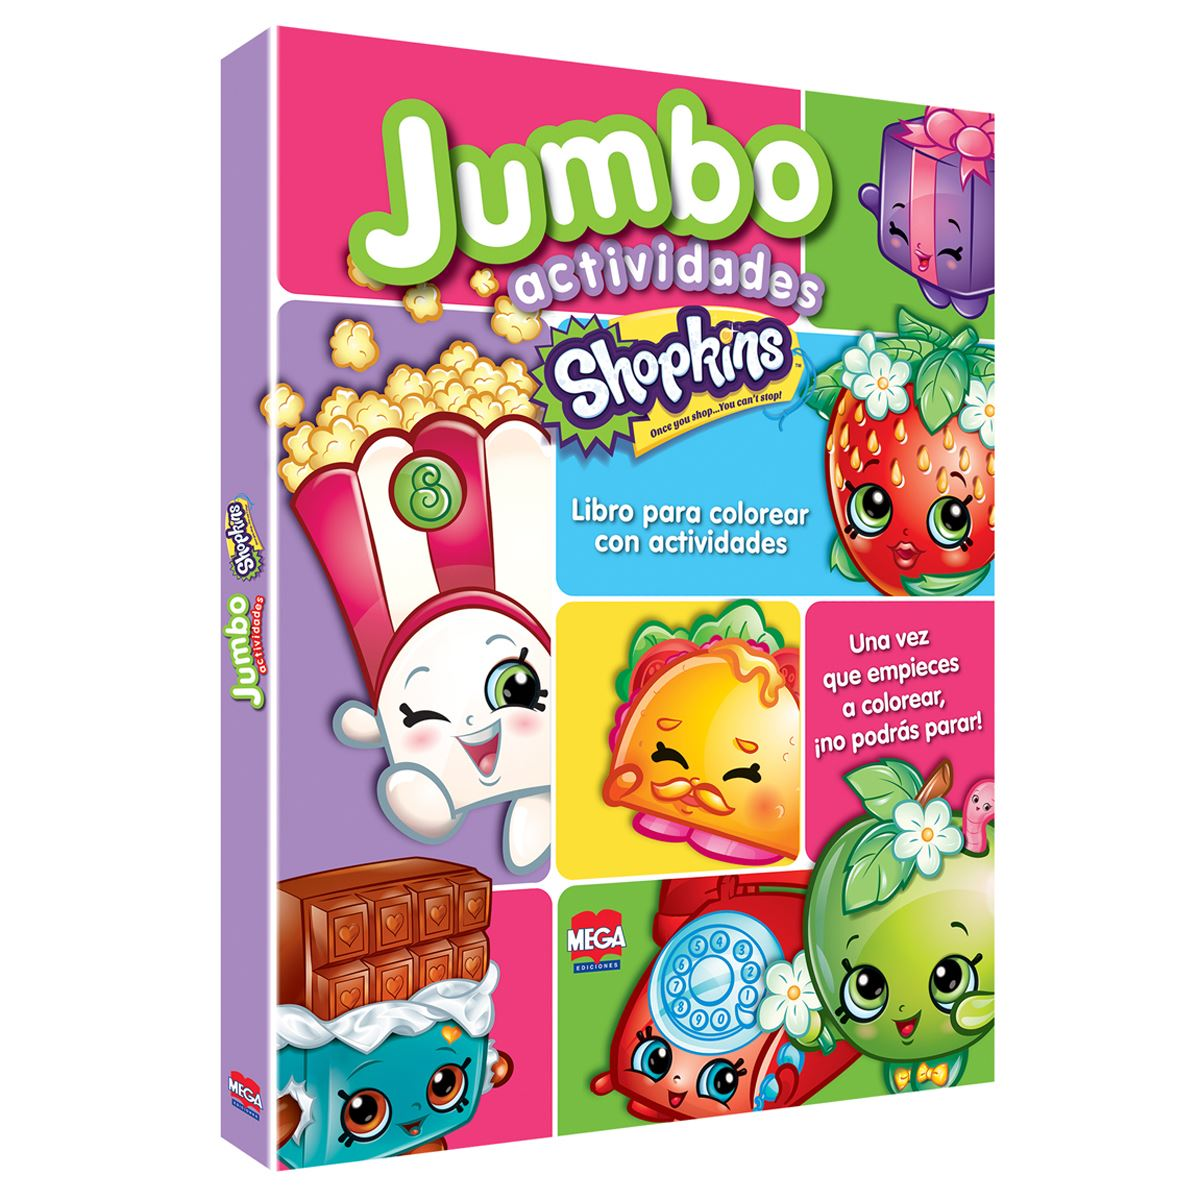 Shopkins Jumbo actividades